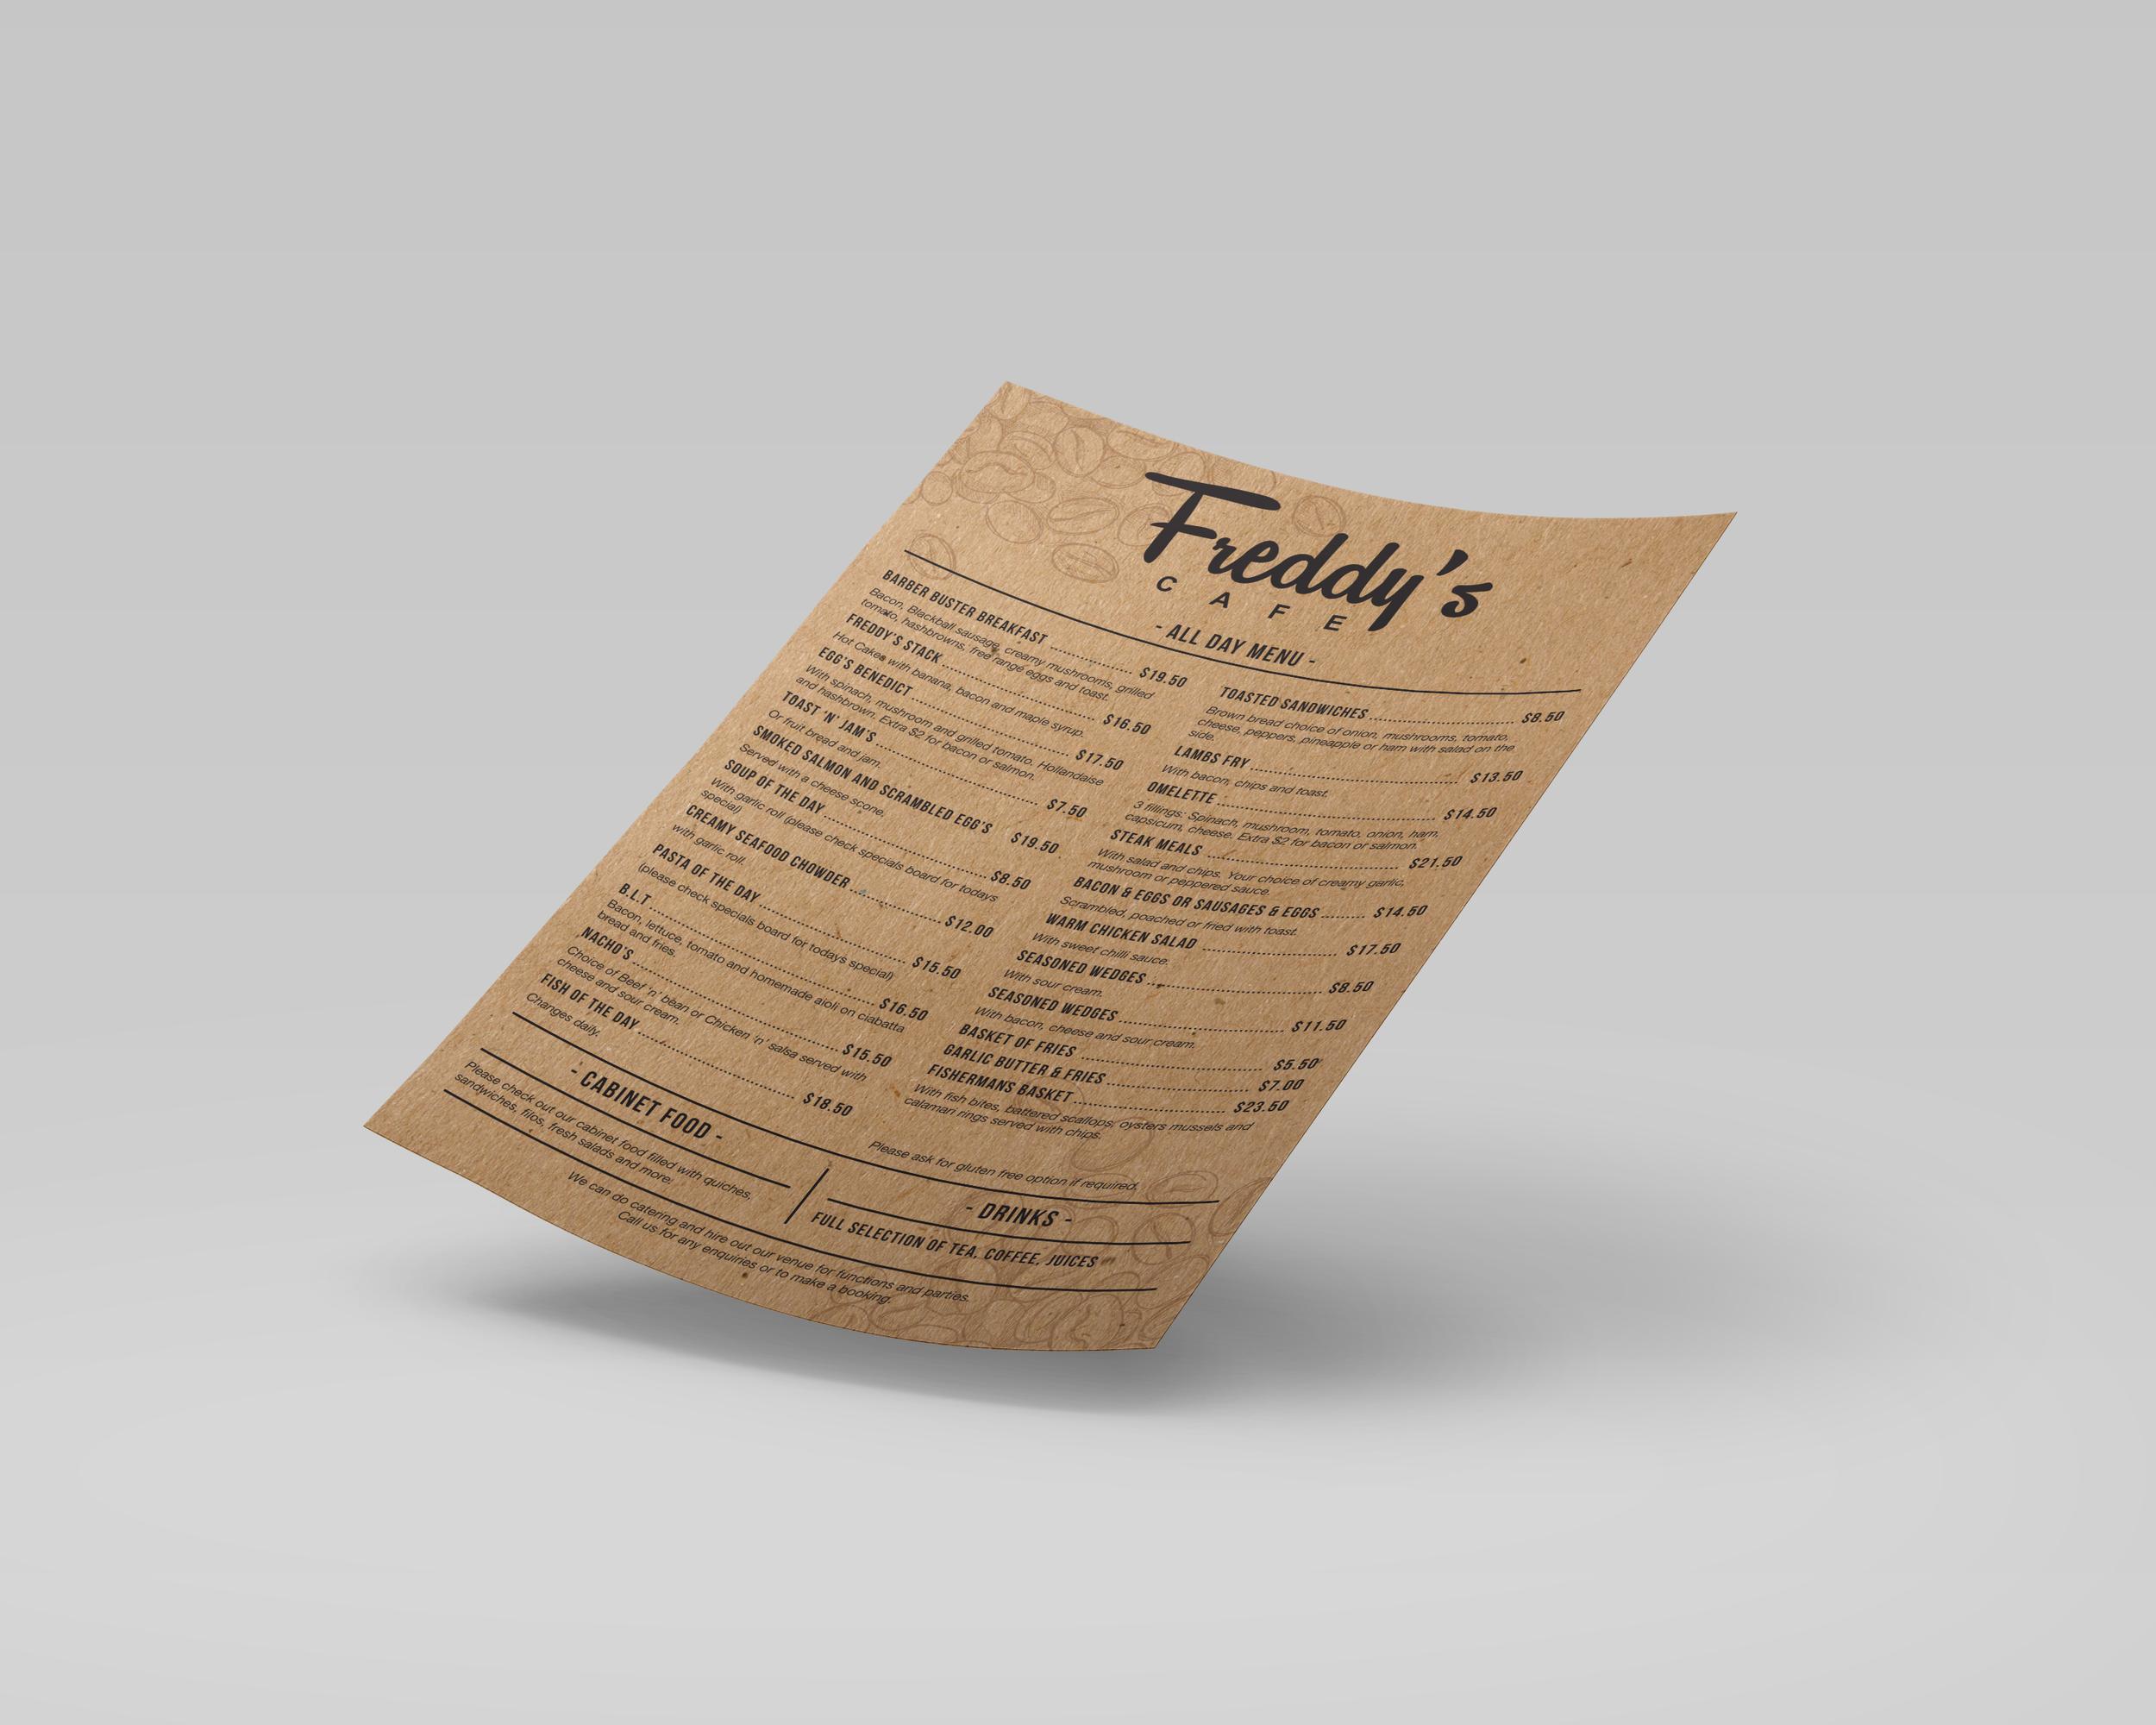 Freddy's Cafe Menu Design